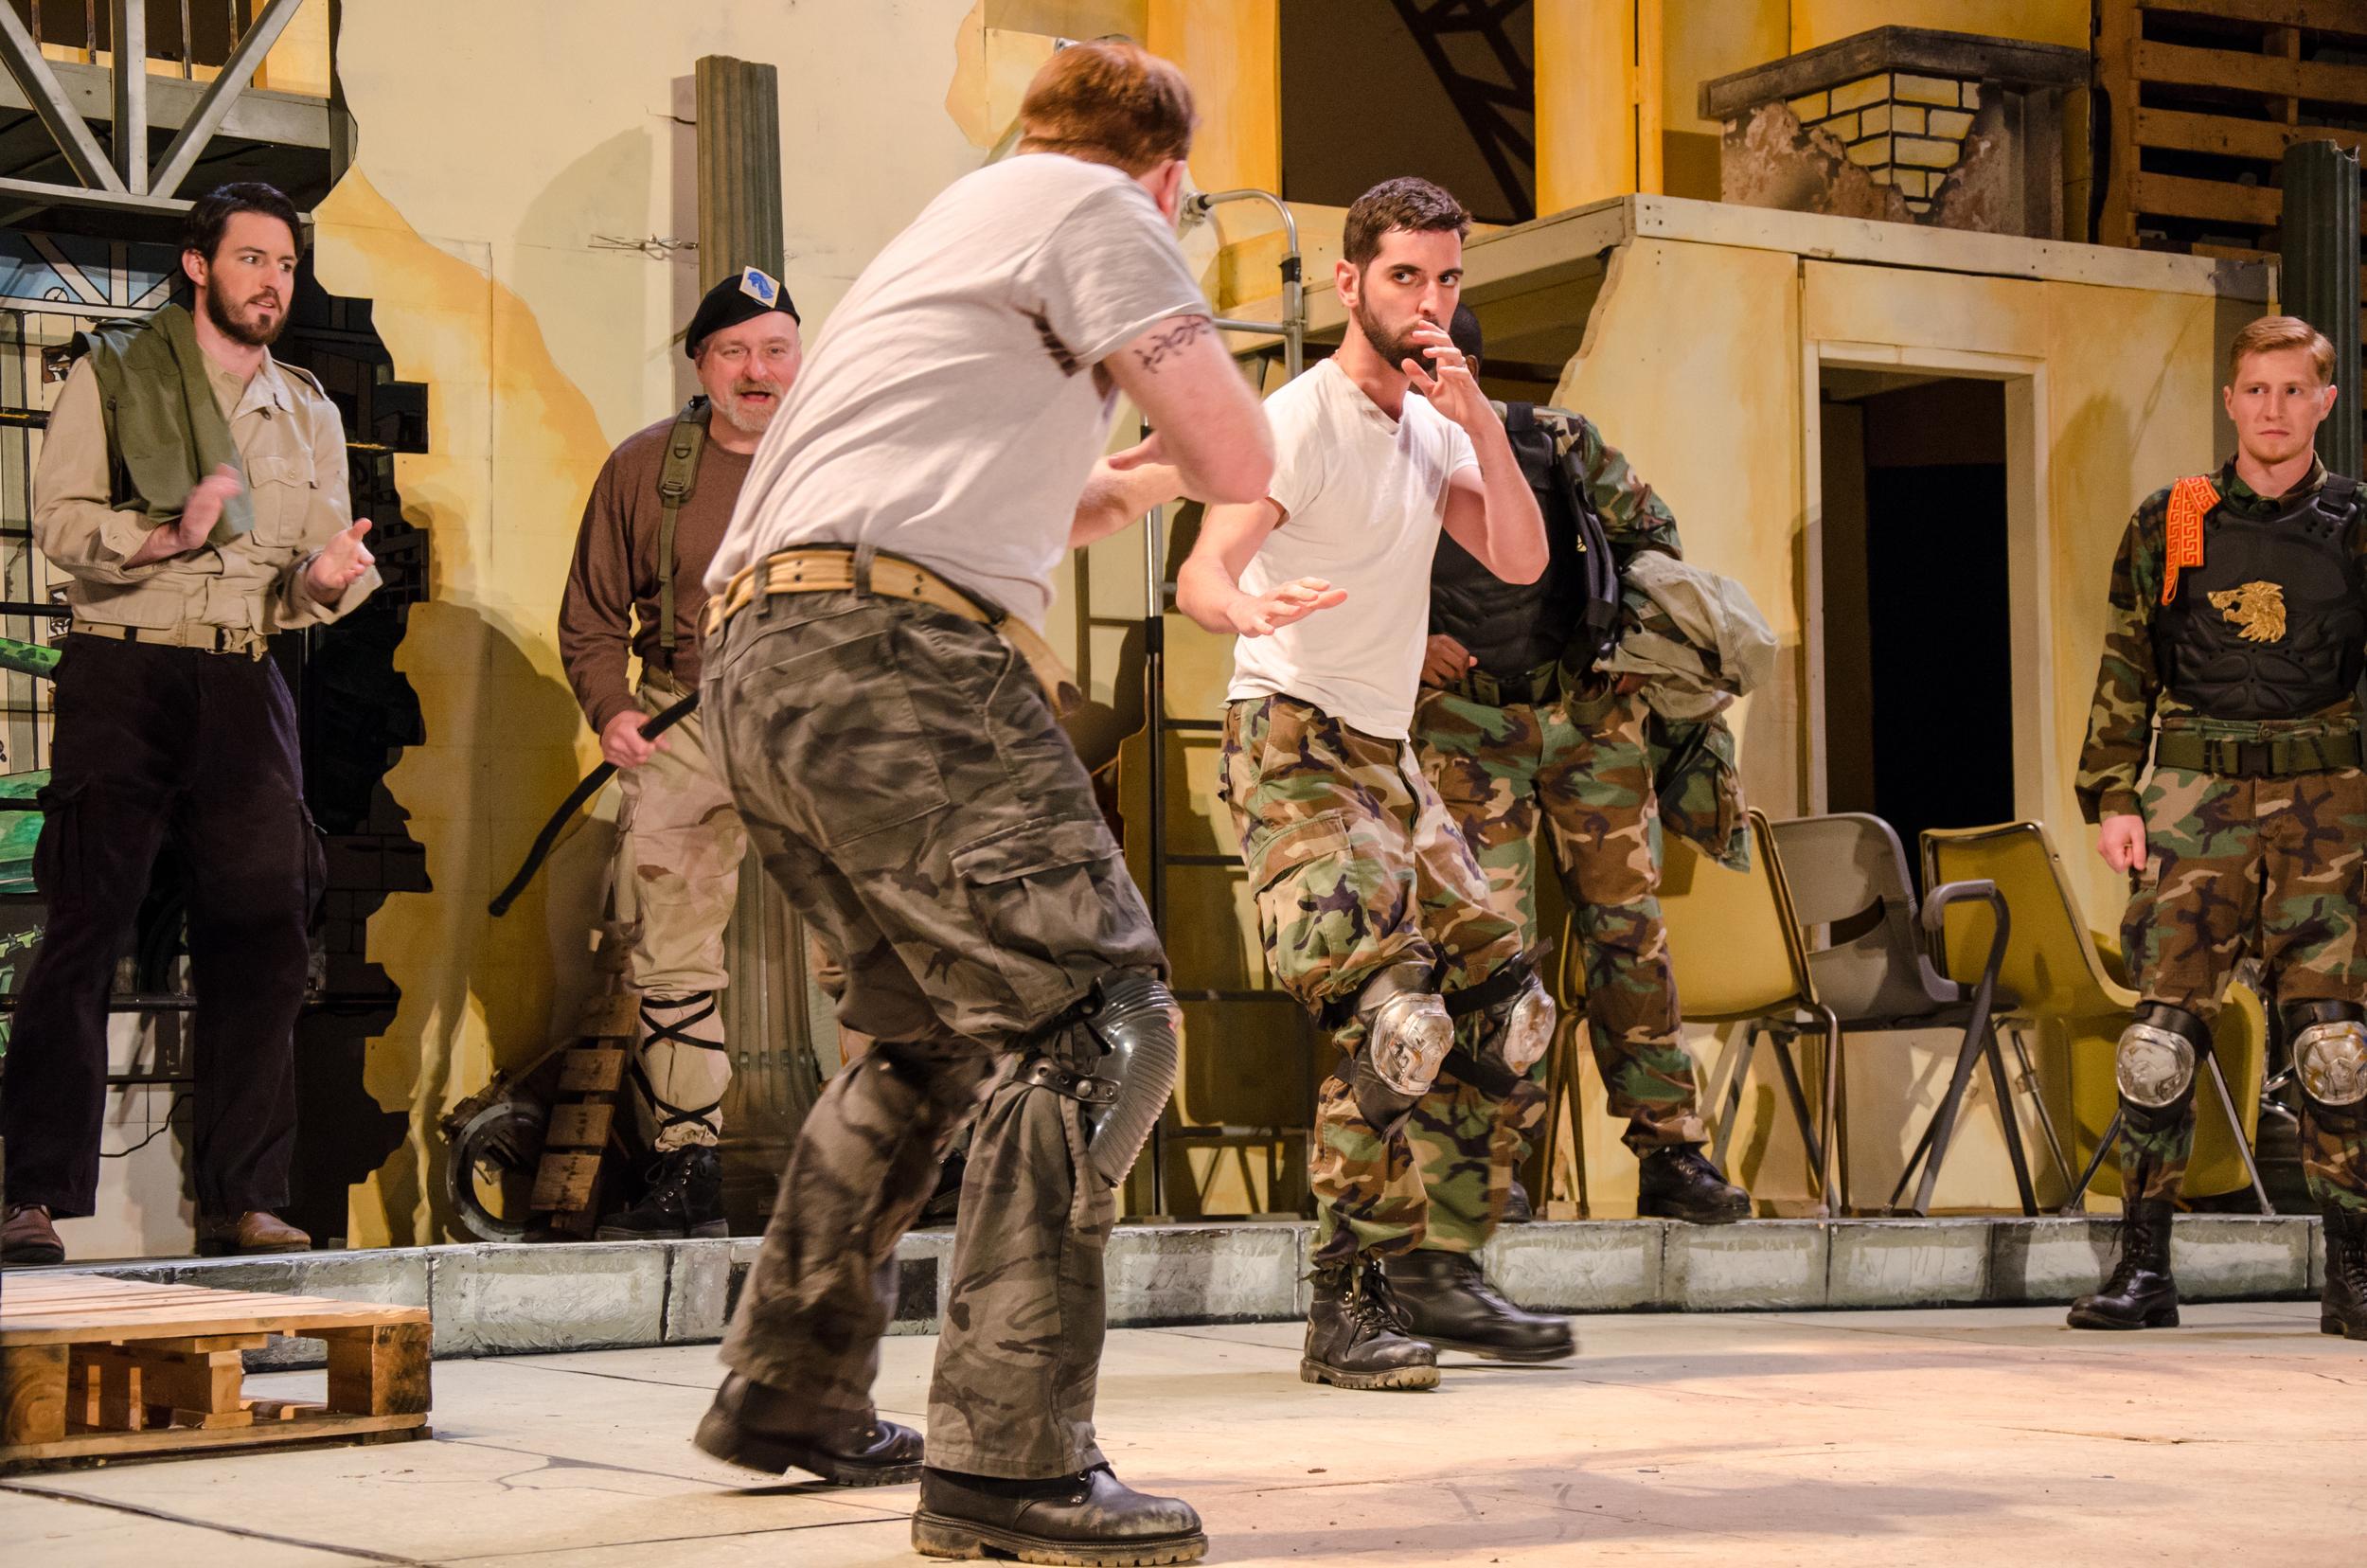 Diomedes (Ross Carmichael), Nestor (Jeff Wasileski), Ajax (Nicholas Wasileski), Hector (Sean Adams), Aeneas (Bernard Joseph), Troilus (Jared Calhoun)